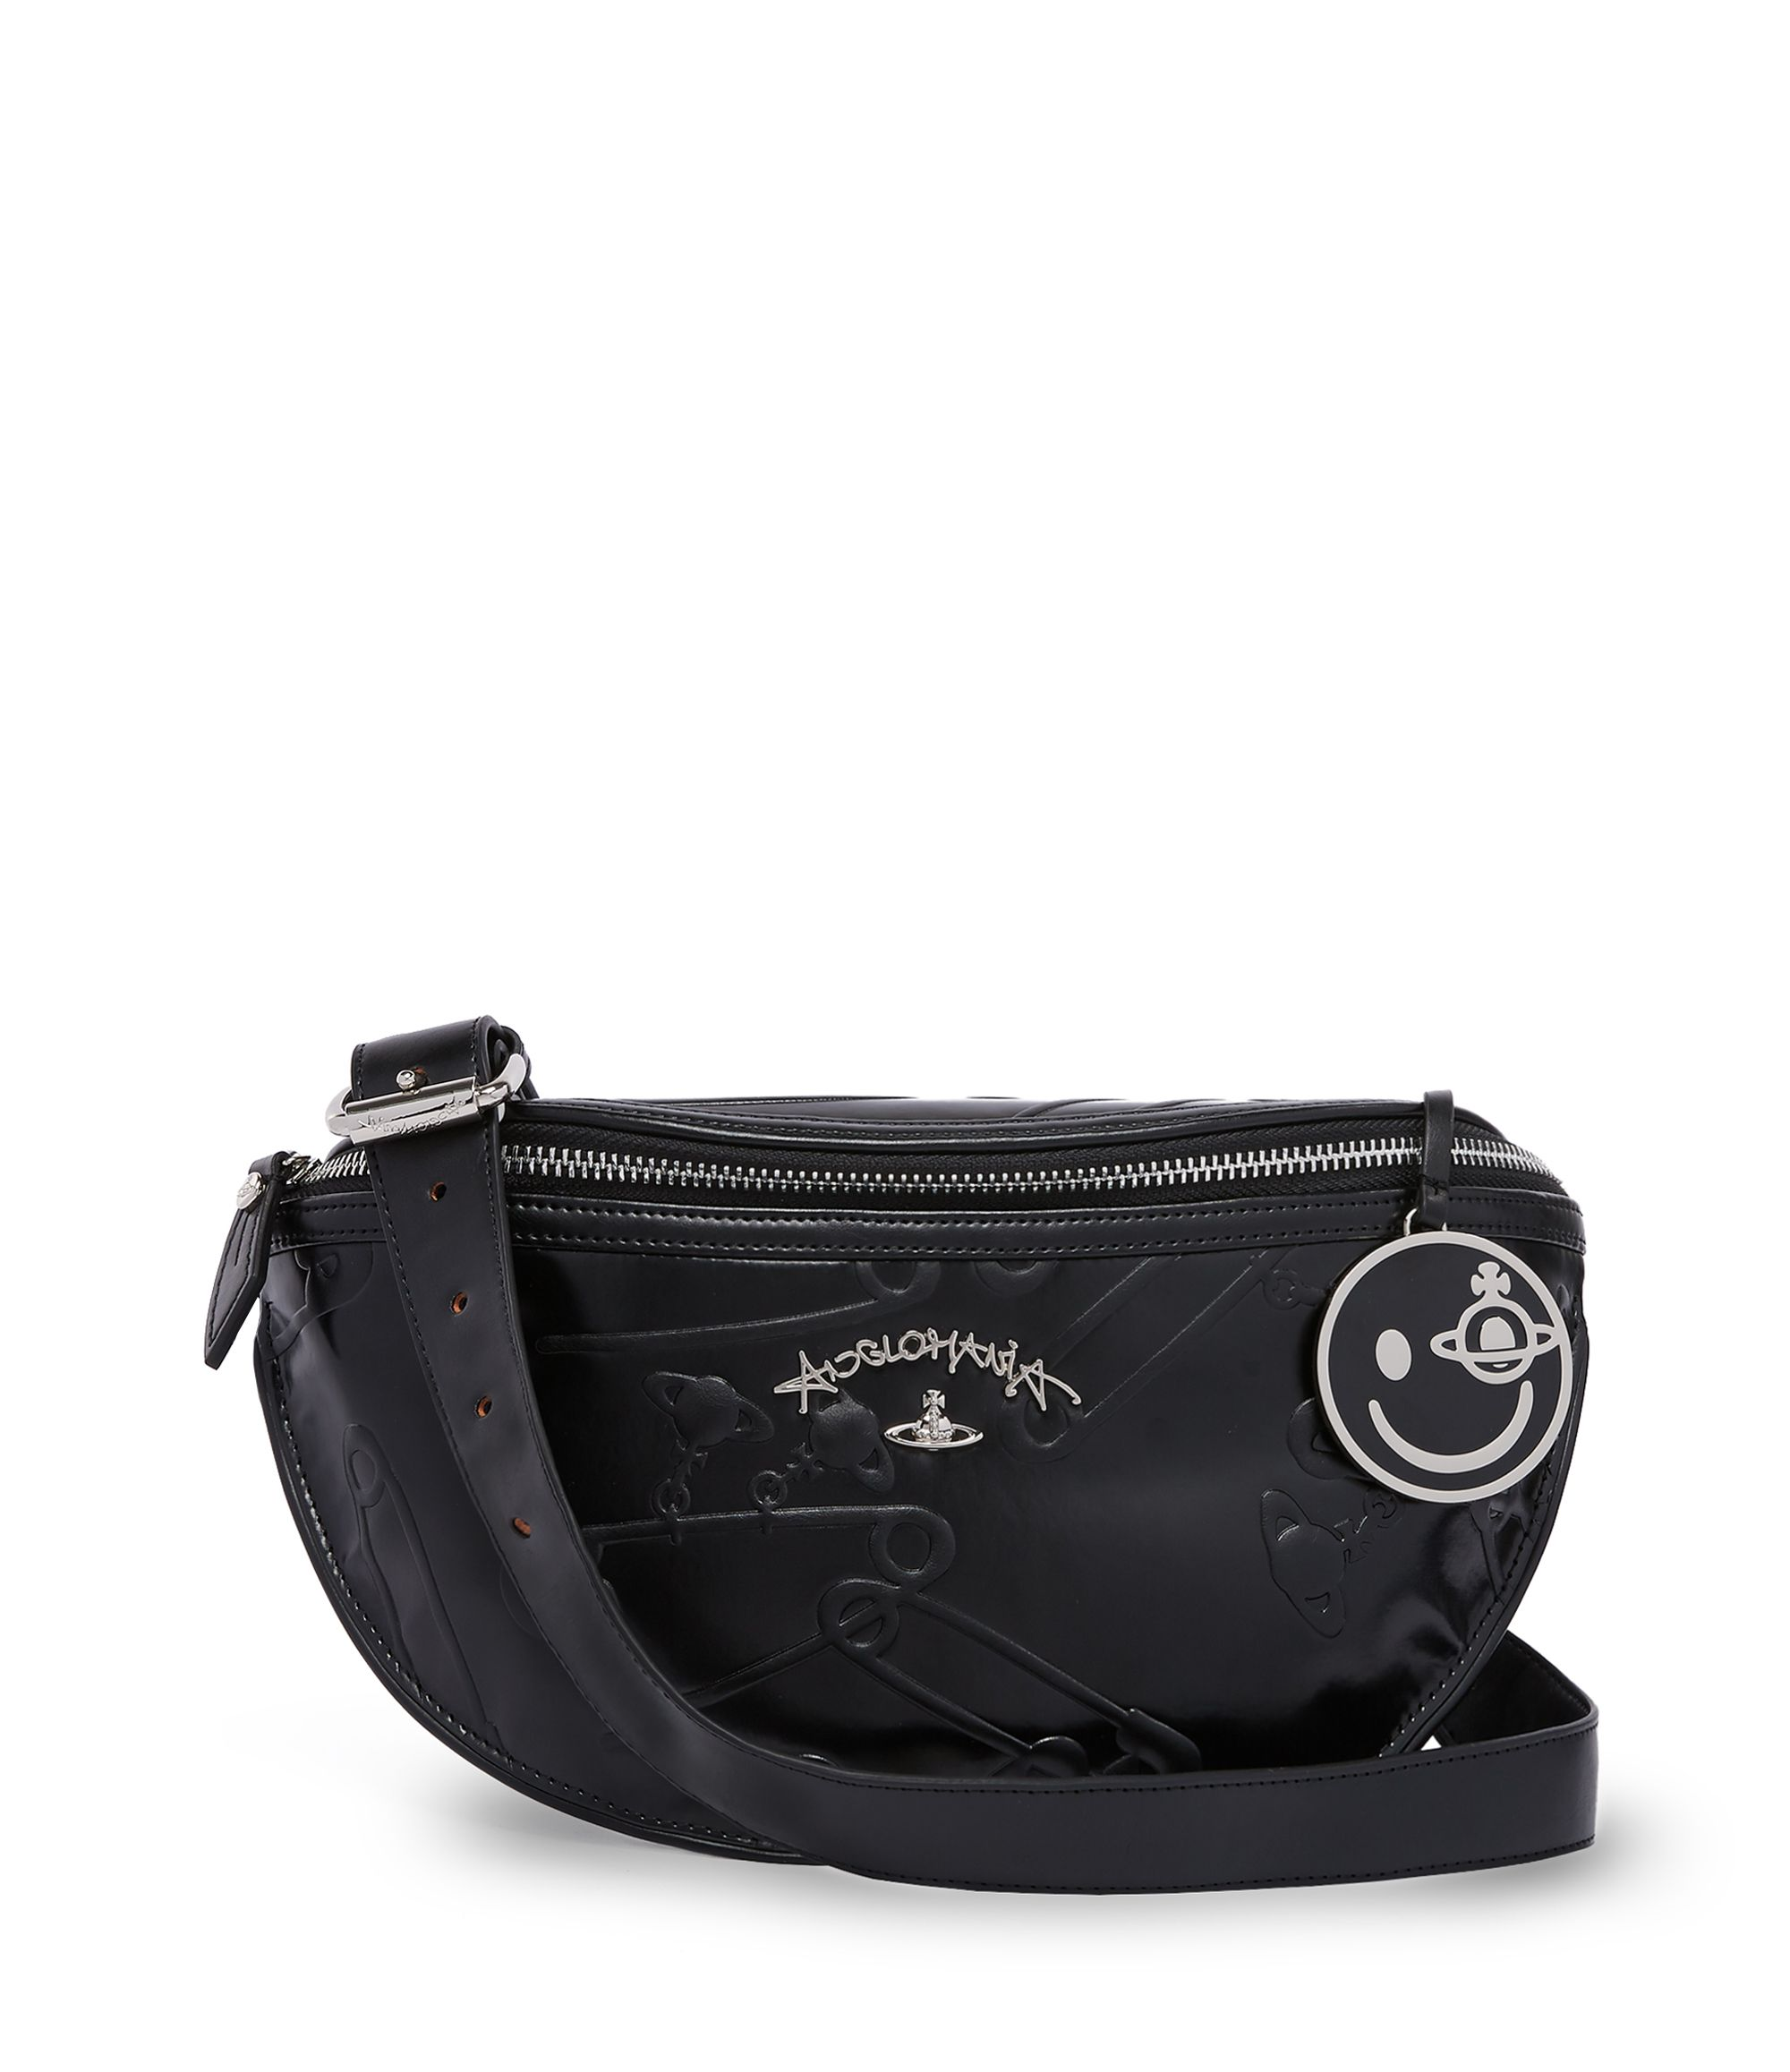 859a4b52f879 VIVIENNE WESTWOOD Black Safety Pin Bum Bag 13975.  viviennewestwood  bags   leather  belt bags